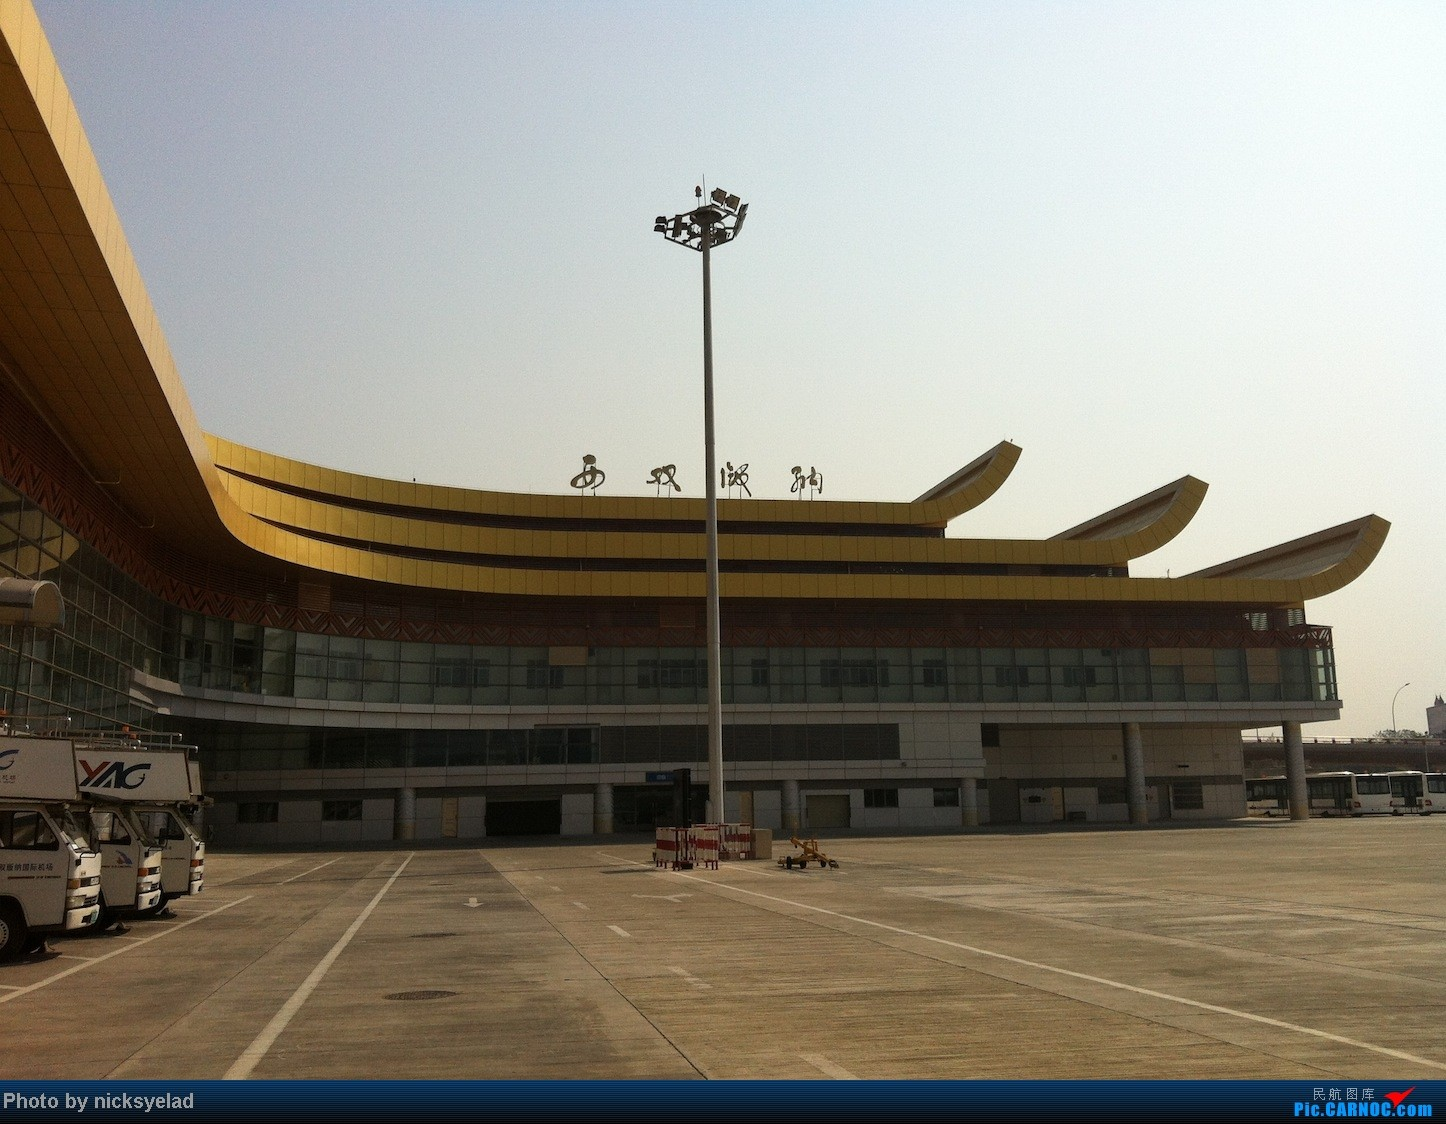 Re:[求]跪求各城市机场航站楼醒目标志LOGO照片,小弟在此谢过了。谢谢谢谢,赠送小飞机o    中国景洪(西双版纳)机场